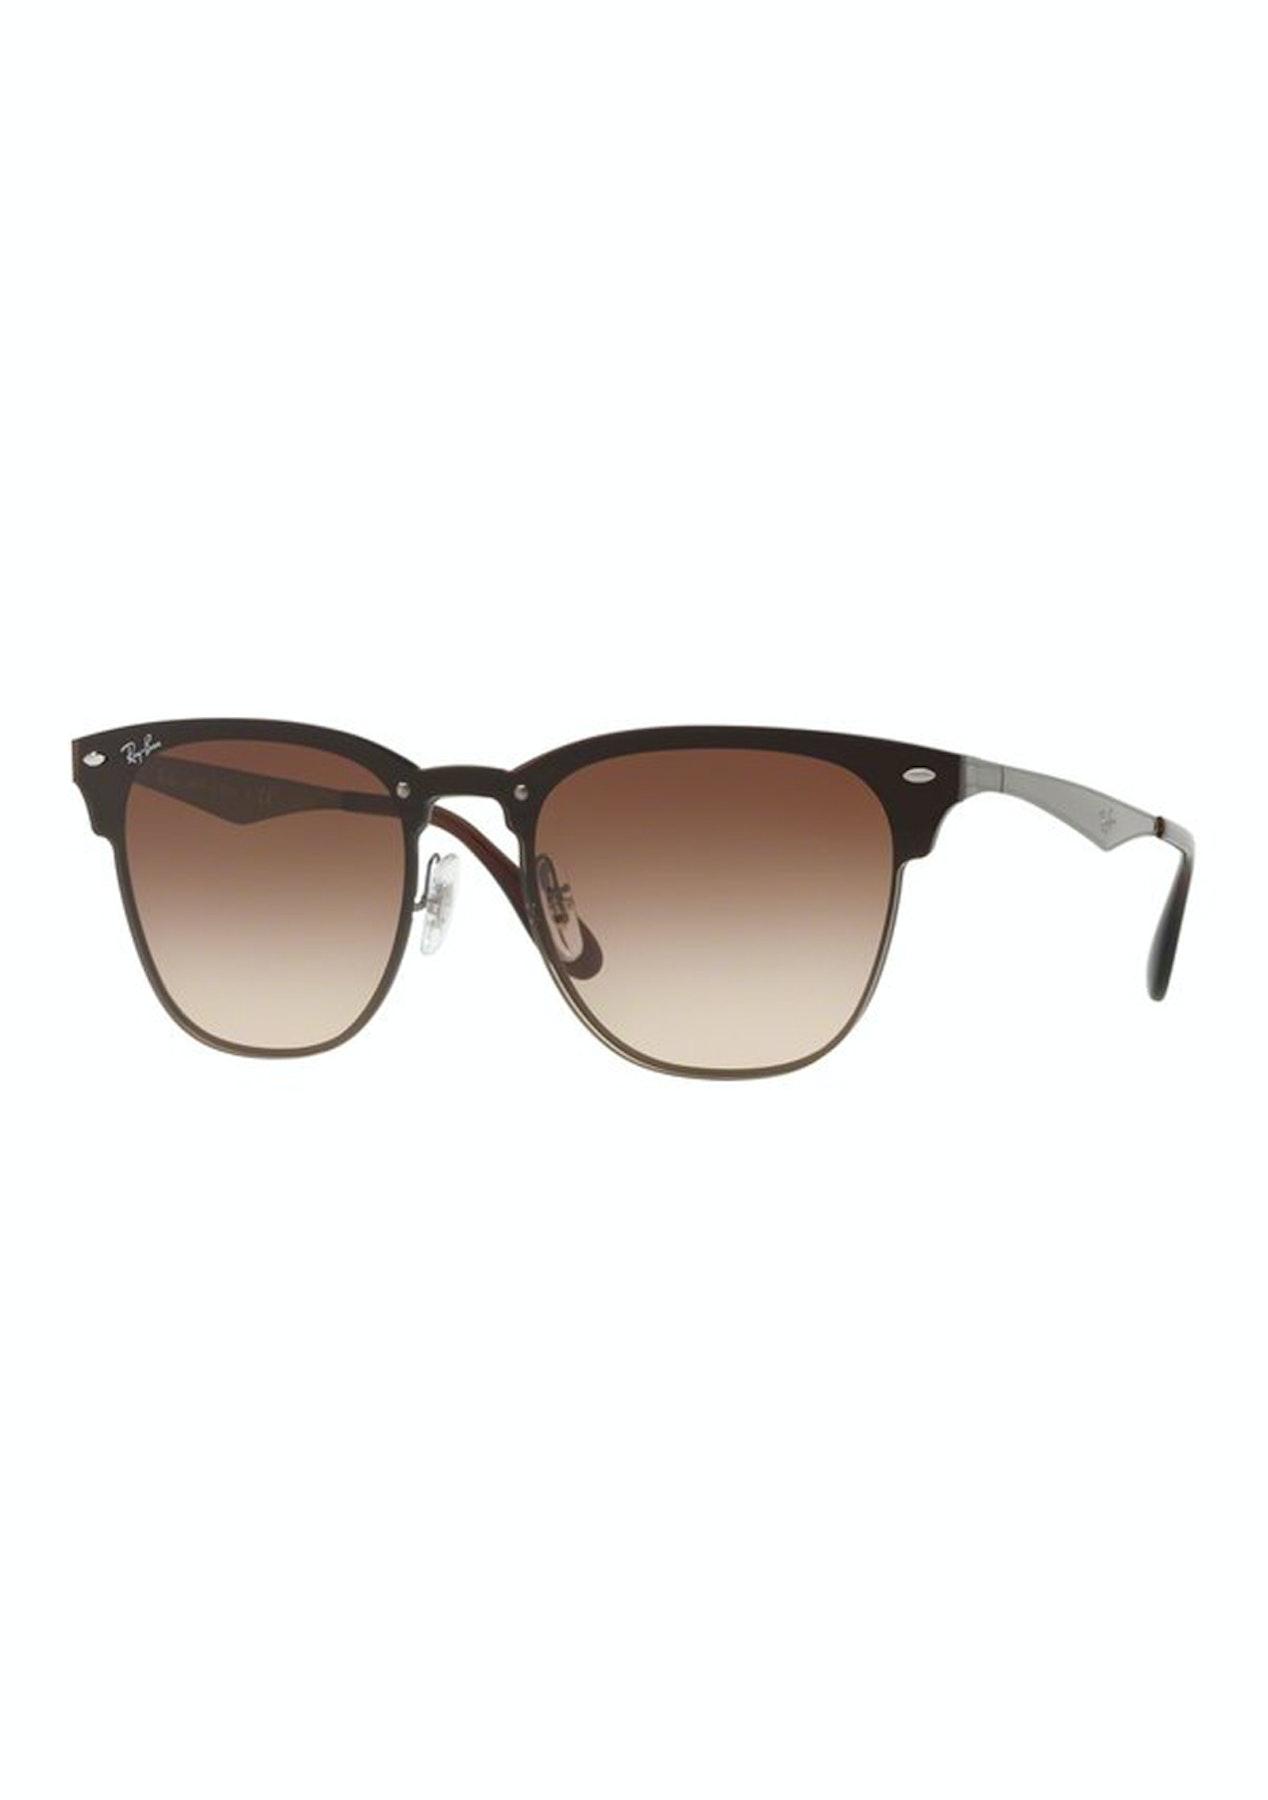 d270b6dcb3 Ray-Ban Blaze Clubmaster Gunmetal Brown Sunglasses - Eyewear Outlet - Onceit